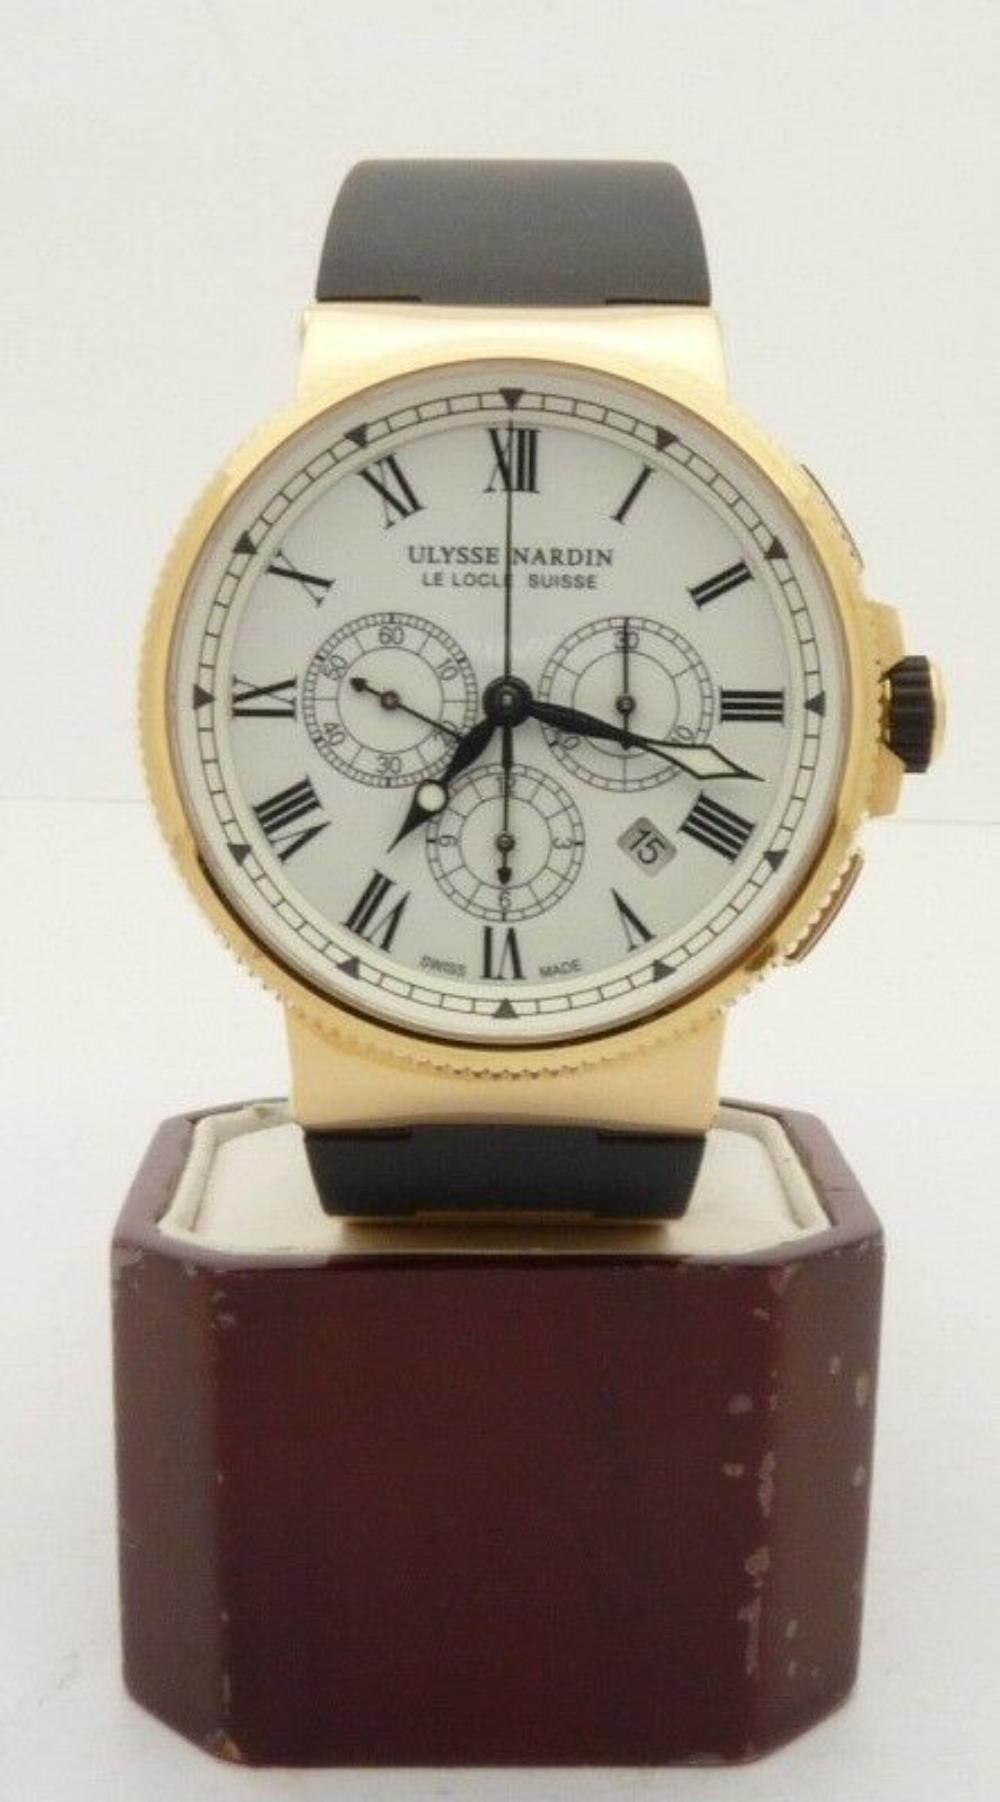 Lot 71: Ulysse Nardin Marine Chronograph Men's Watch 18K Gold